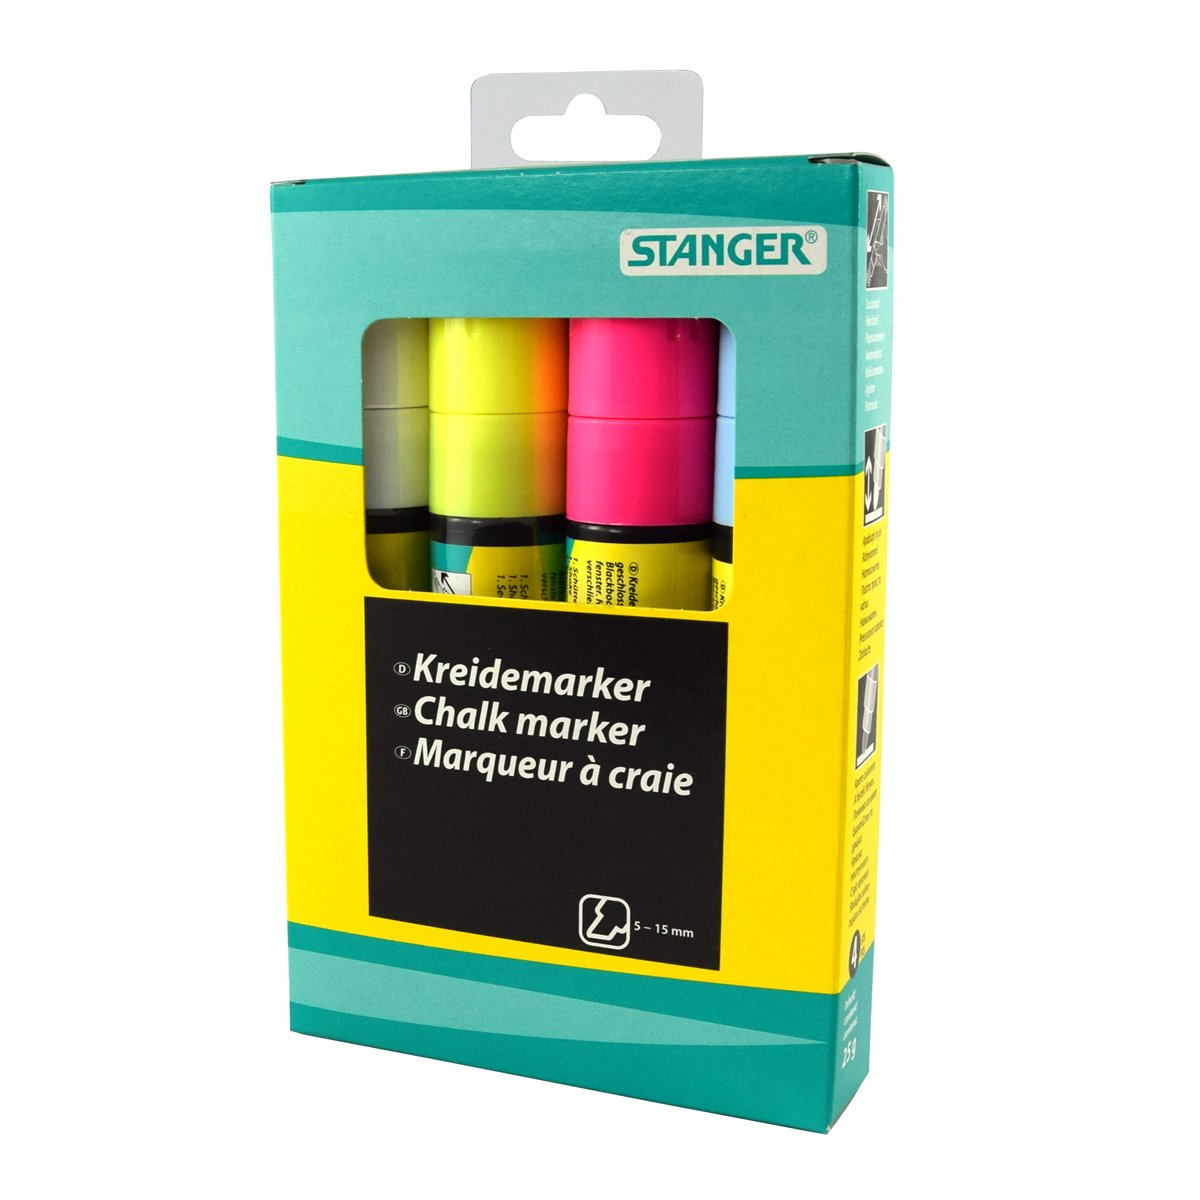 STANGER 620075Jumbo Chalk Marker Set White/Yellow/Pink/Blue